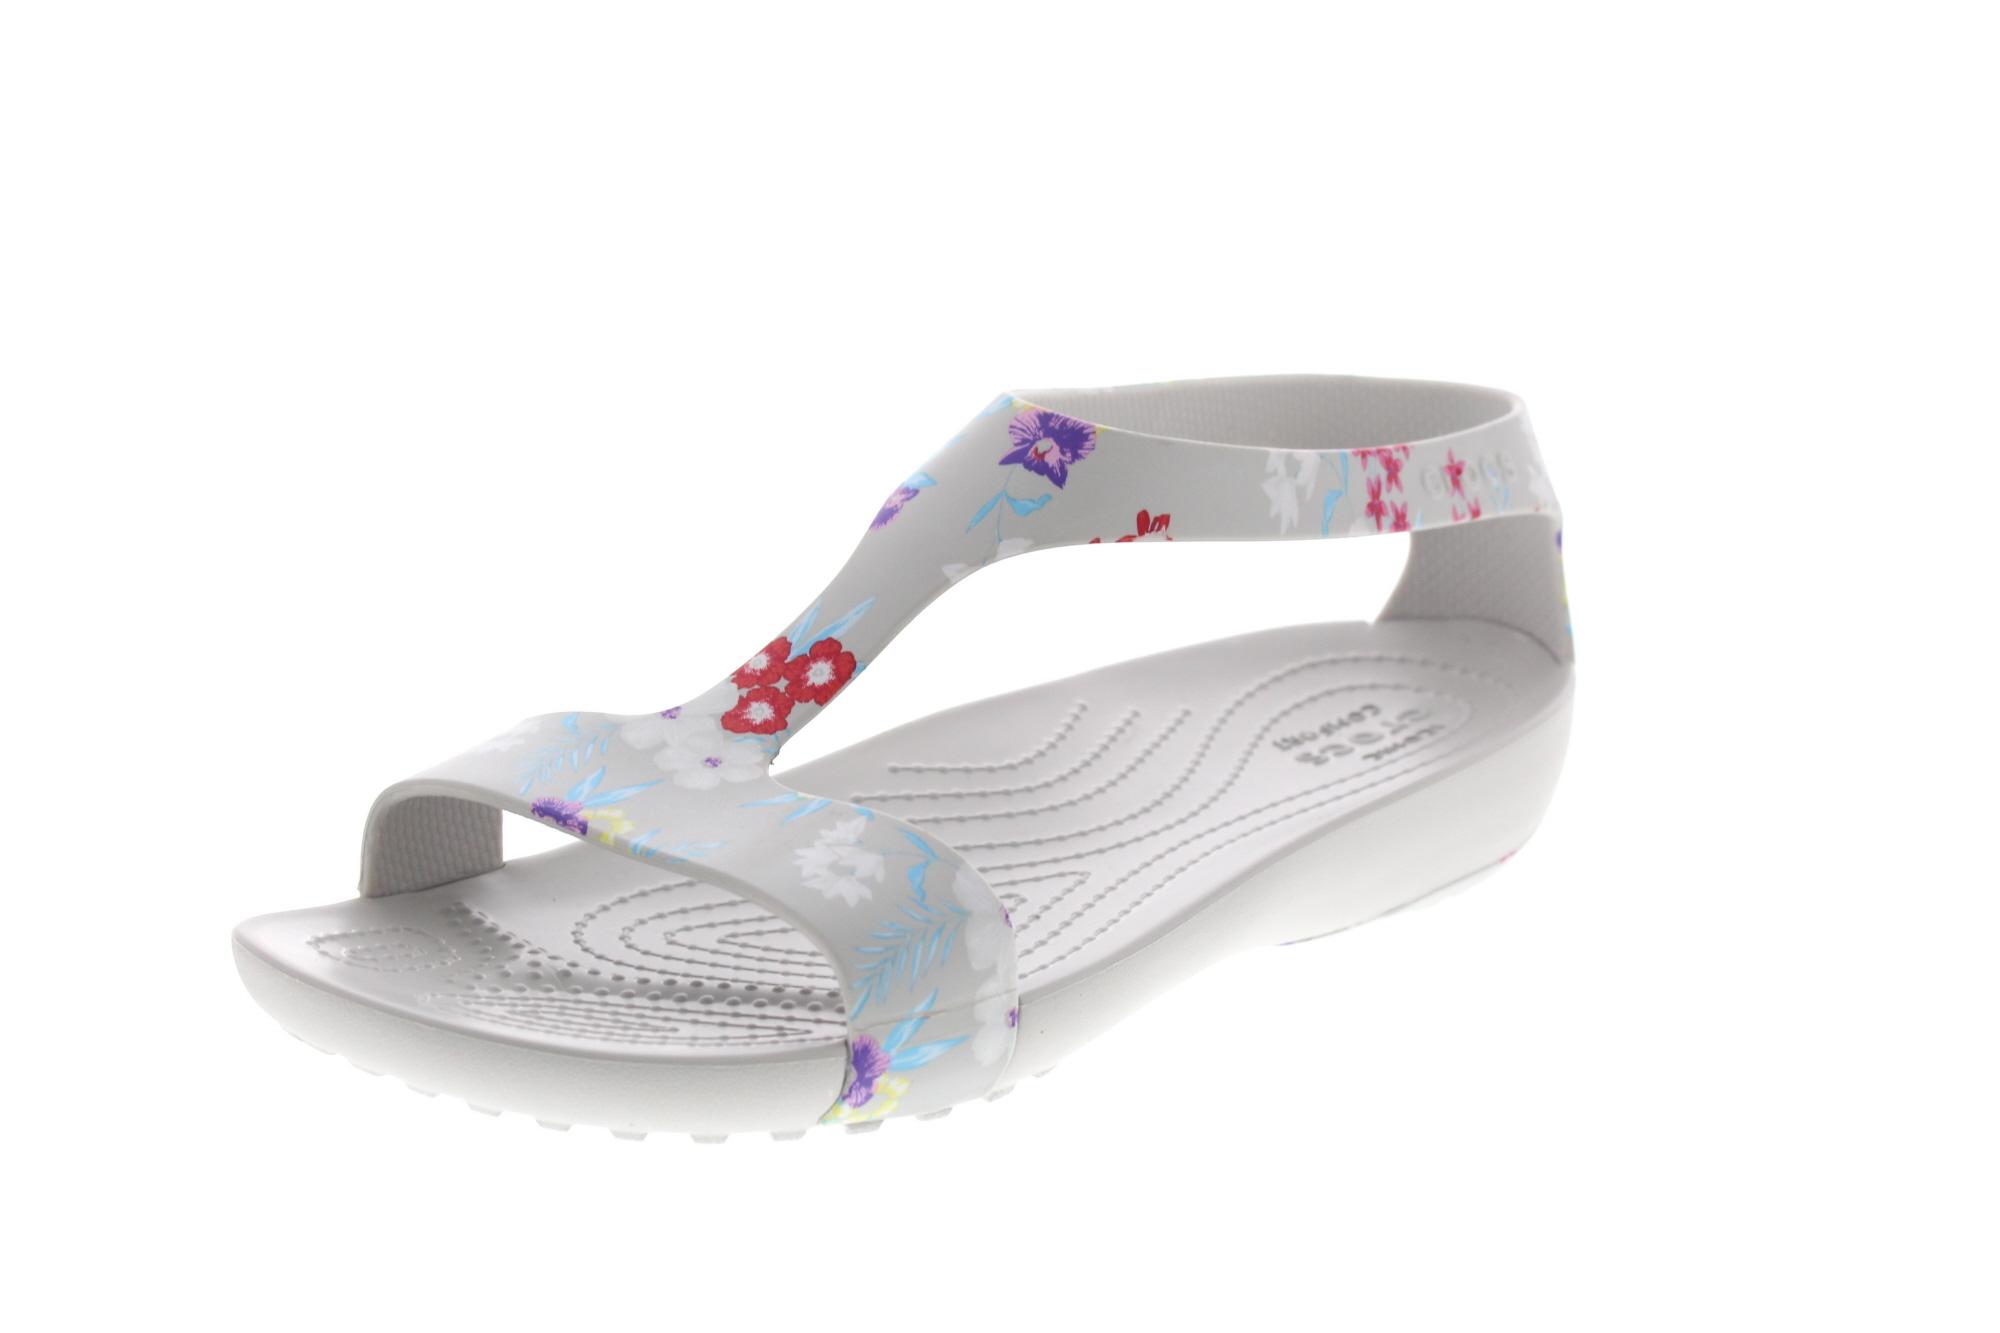 Crocs Serena Graphic Sandal Tropical Floral Pearl White